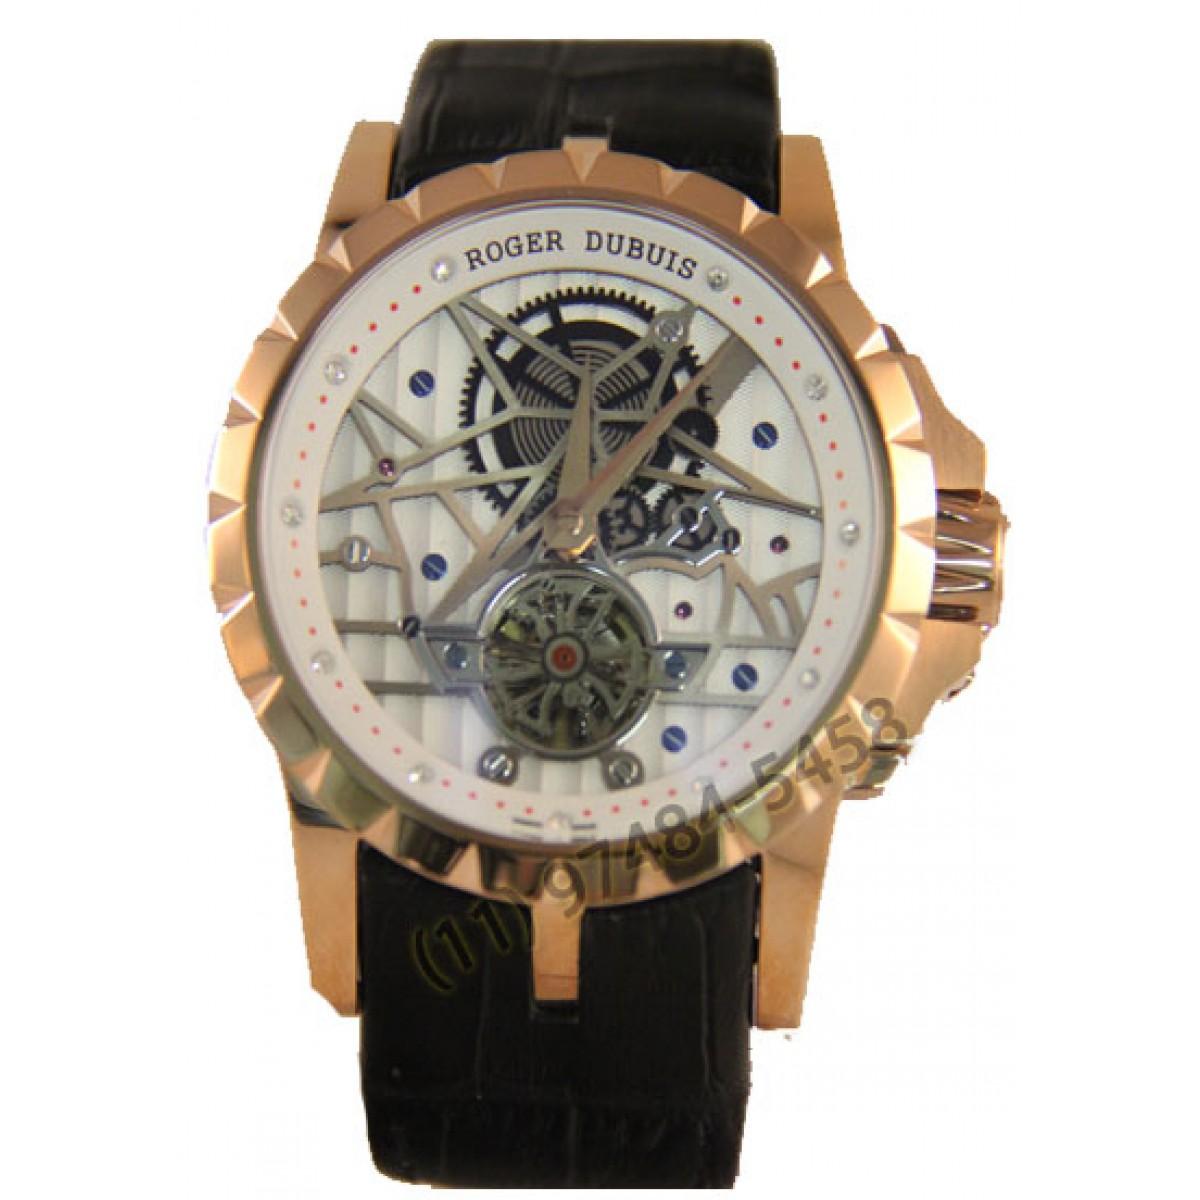 2a6485d128a Relógio Réplica Roger Dubuis Excalibur Esquelete Rose Branco